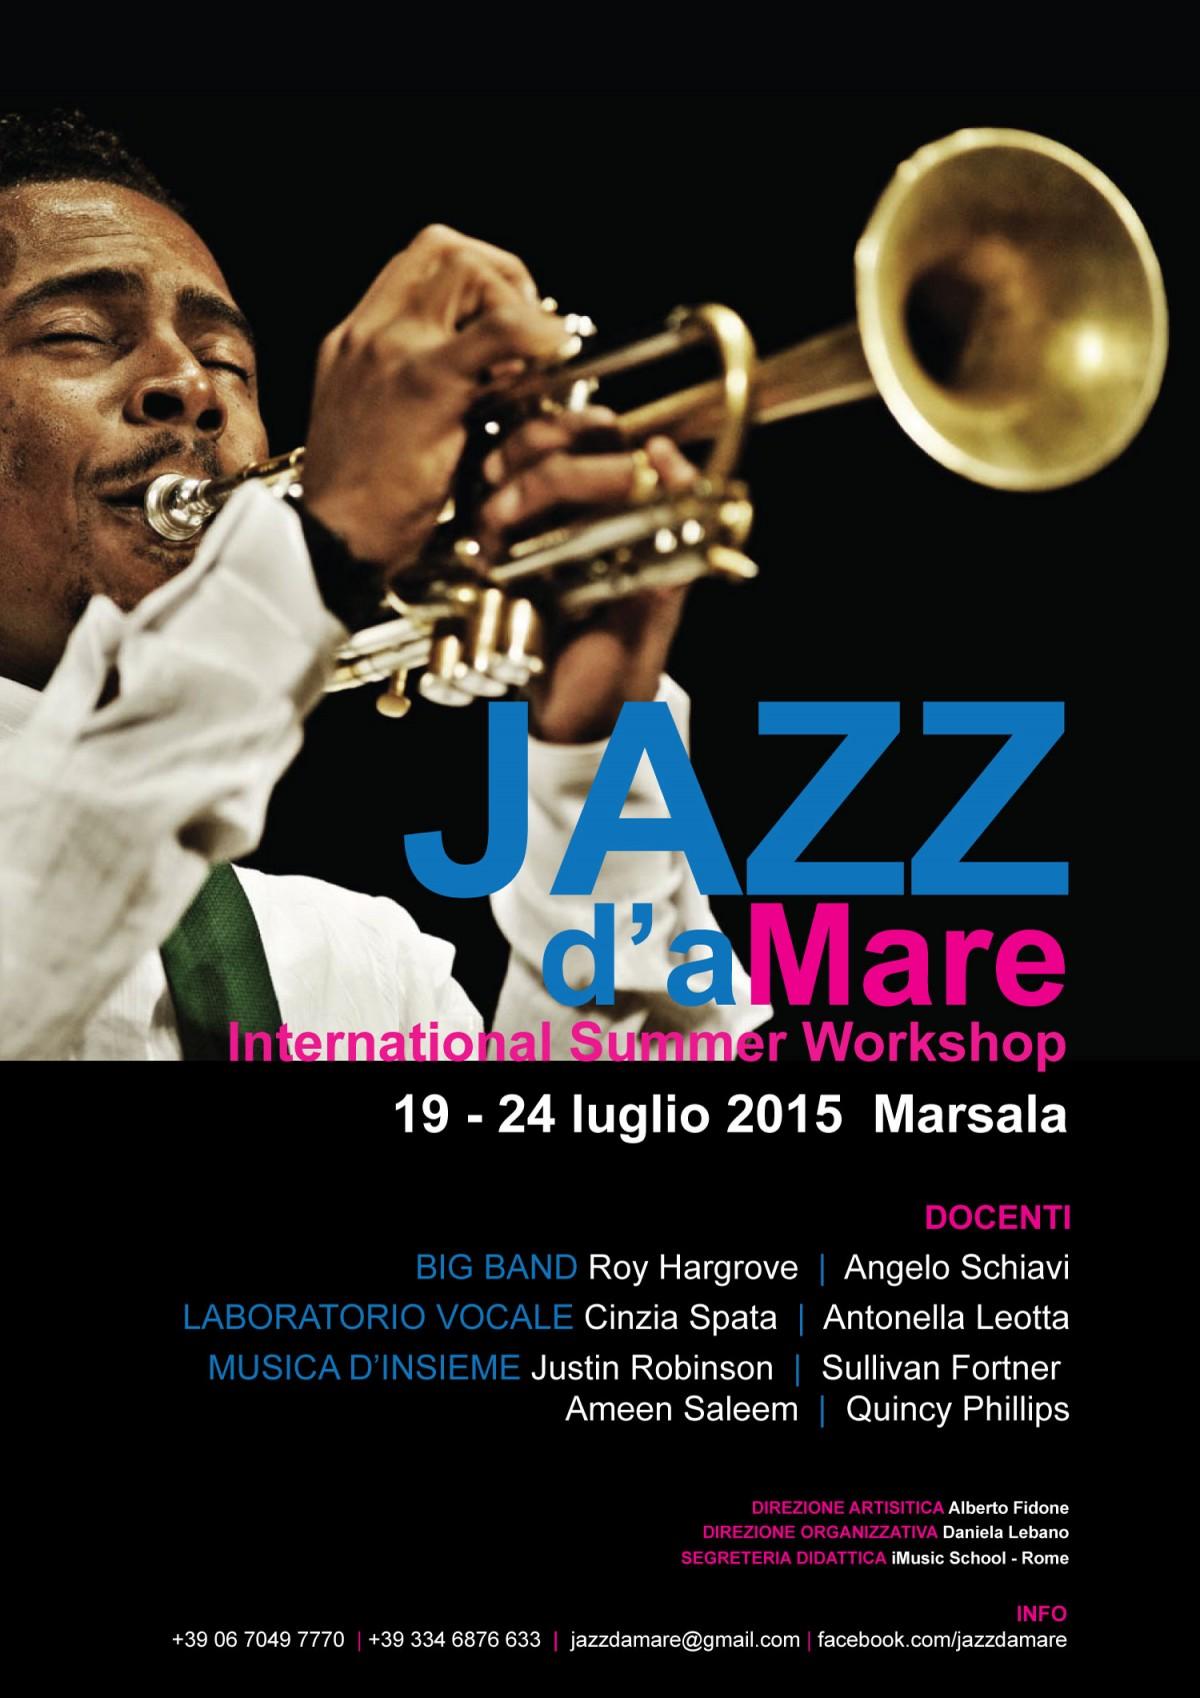 Locandina_Jazz damare_Roy